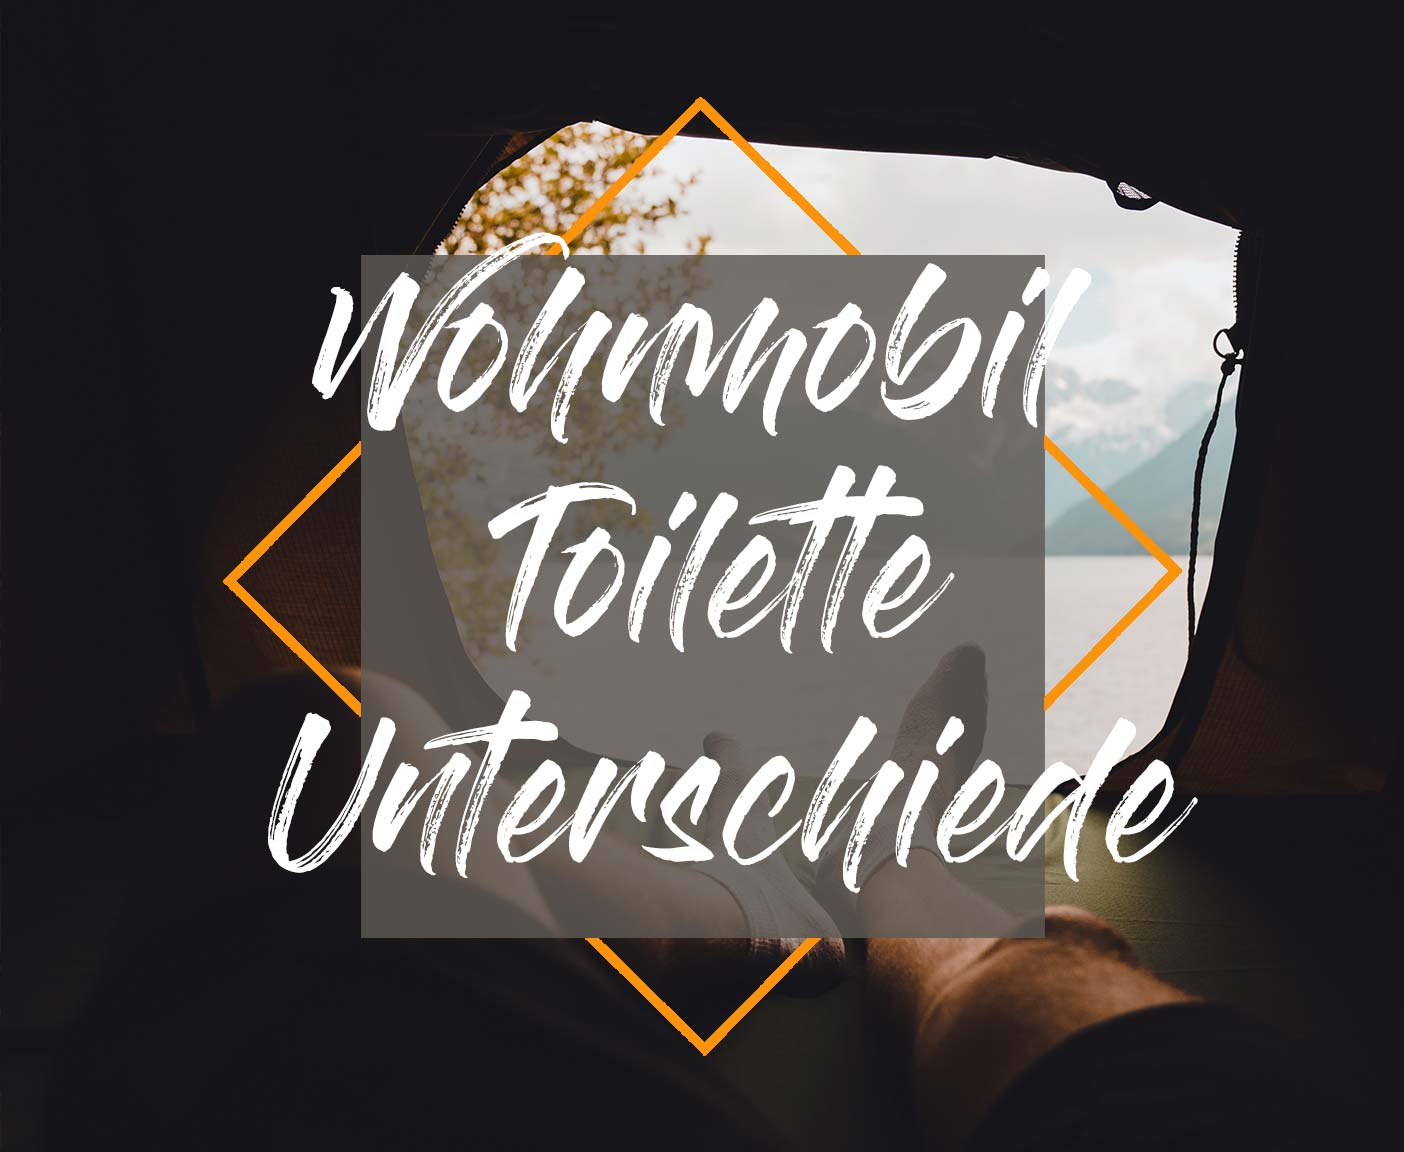 wohnmobil-toilette-unterschied-pota-portie